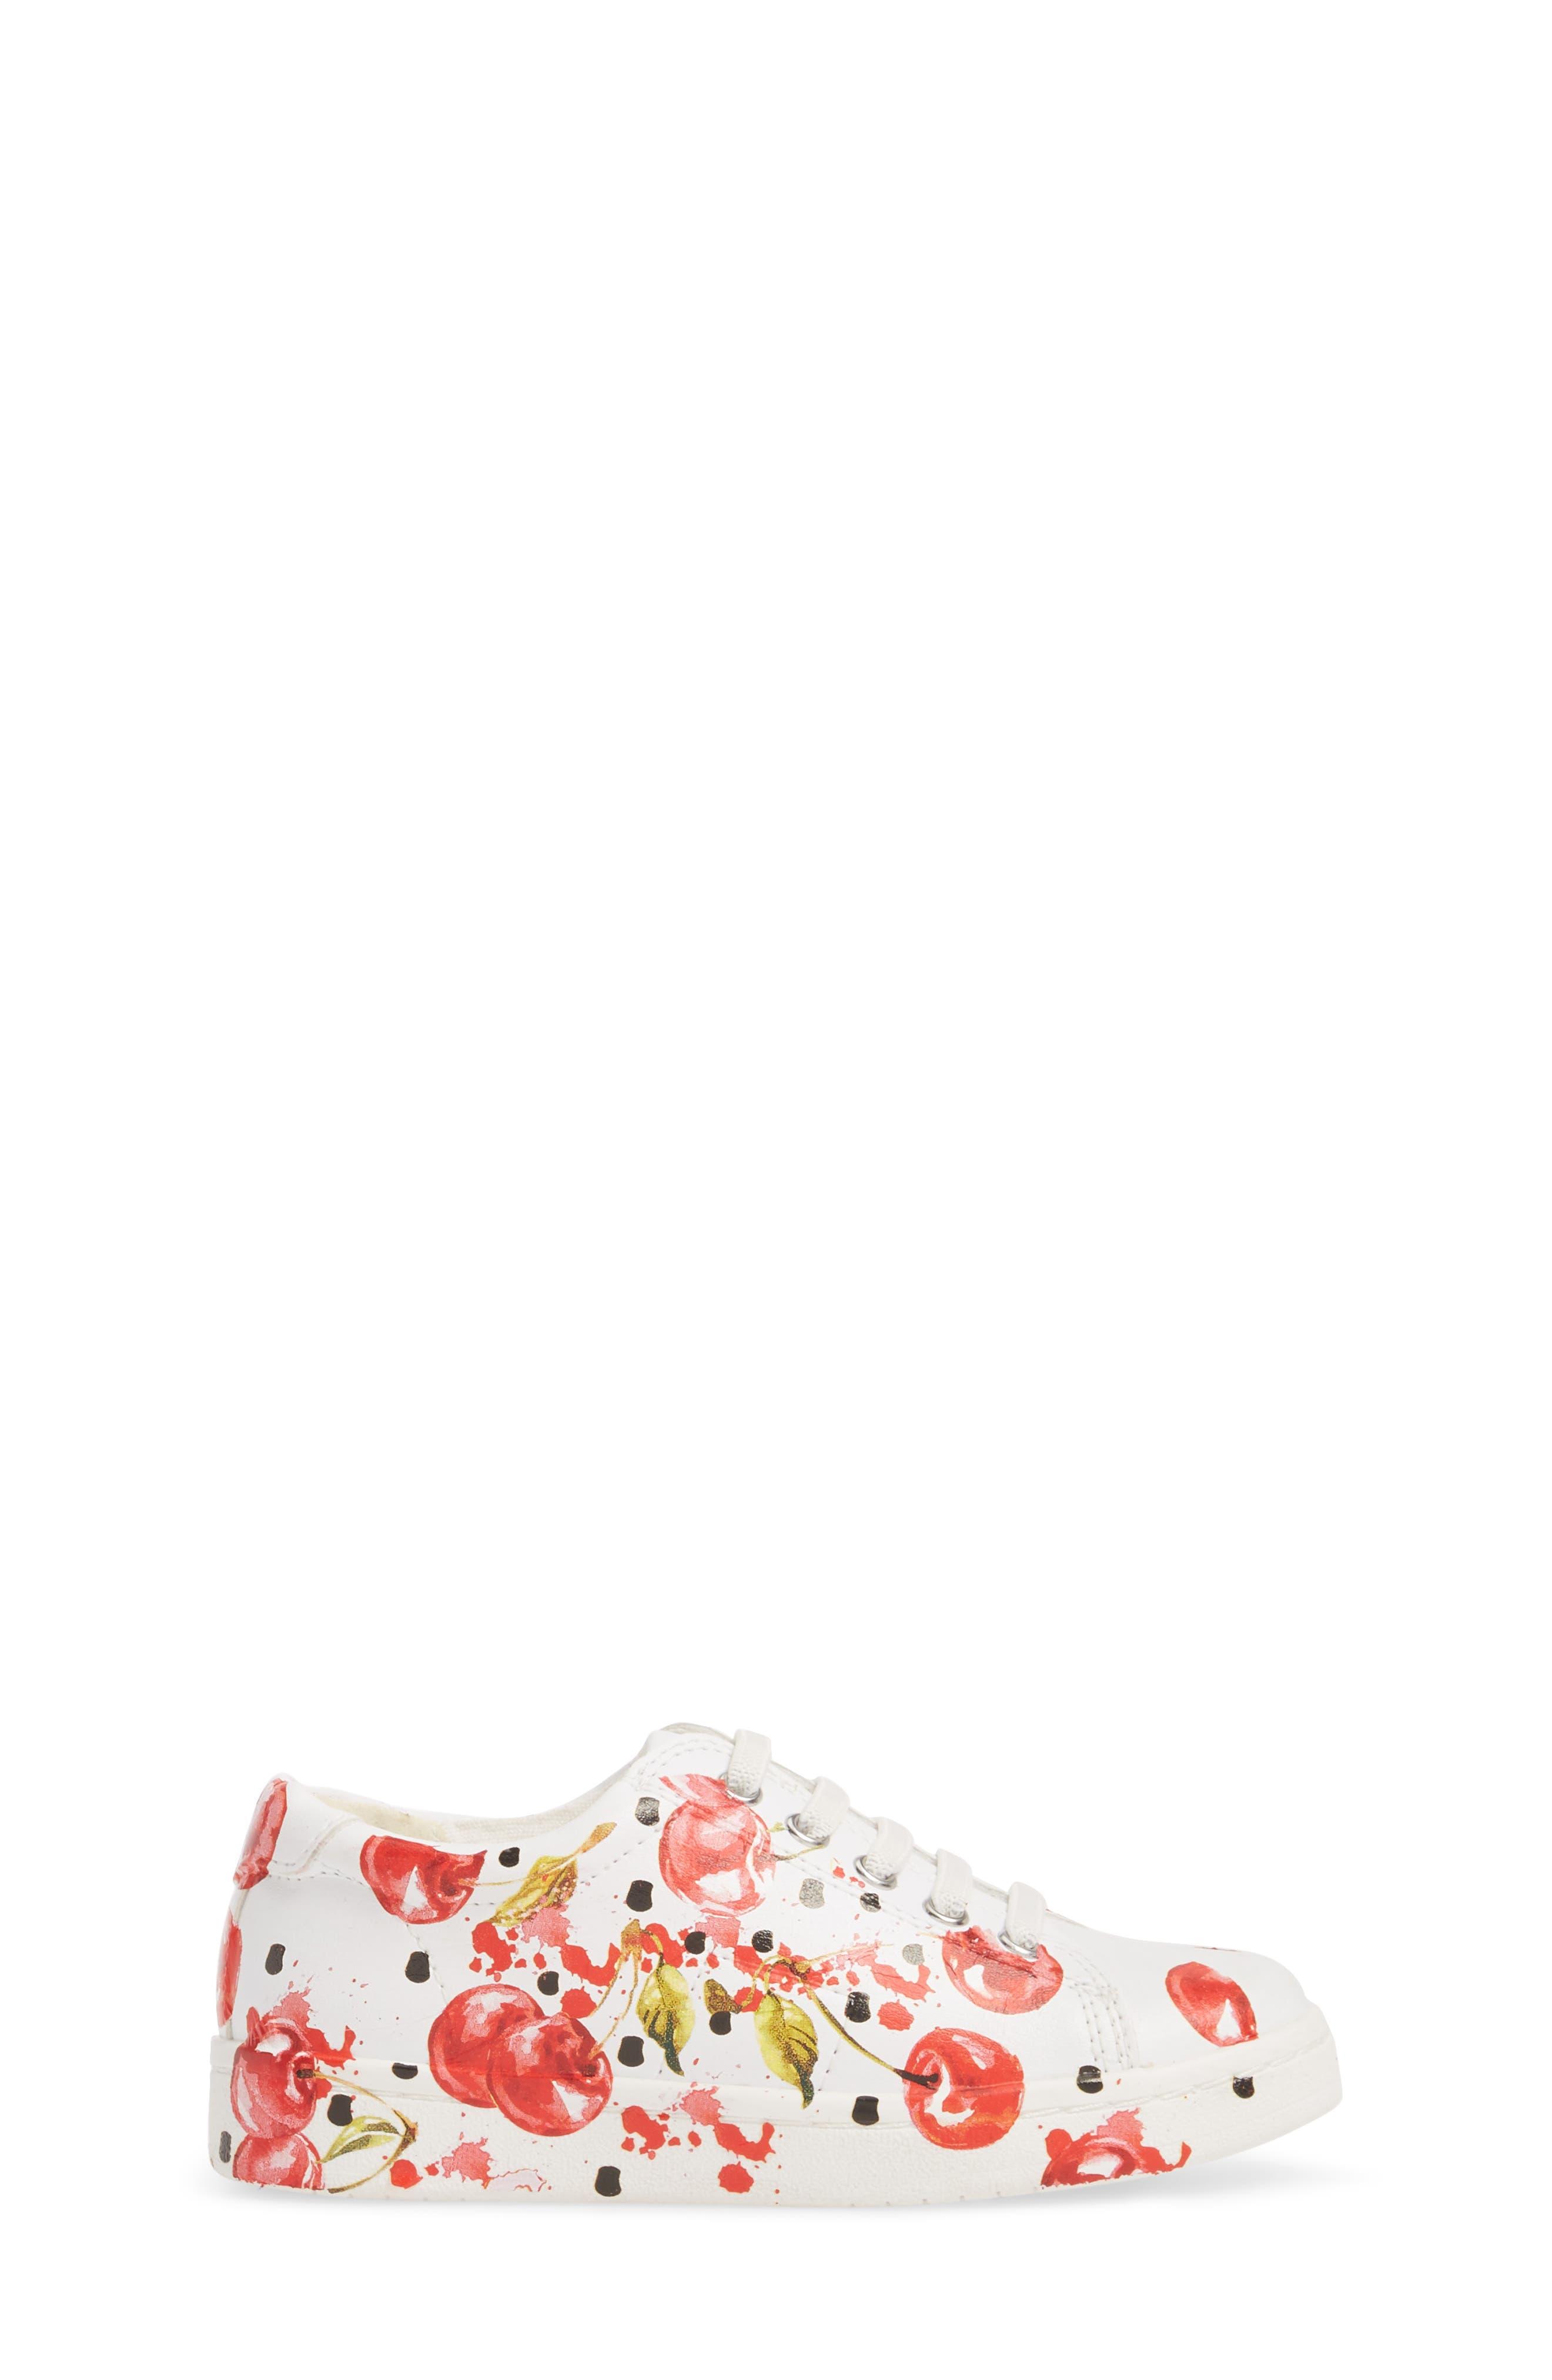 Blane Milford Fruit Print Sneaker,                             Alternate thumbnail 3, color,                             100